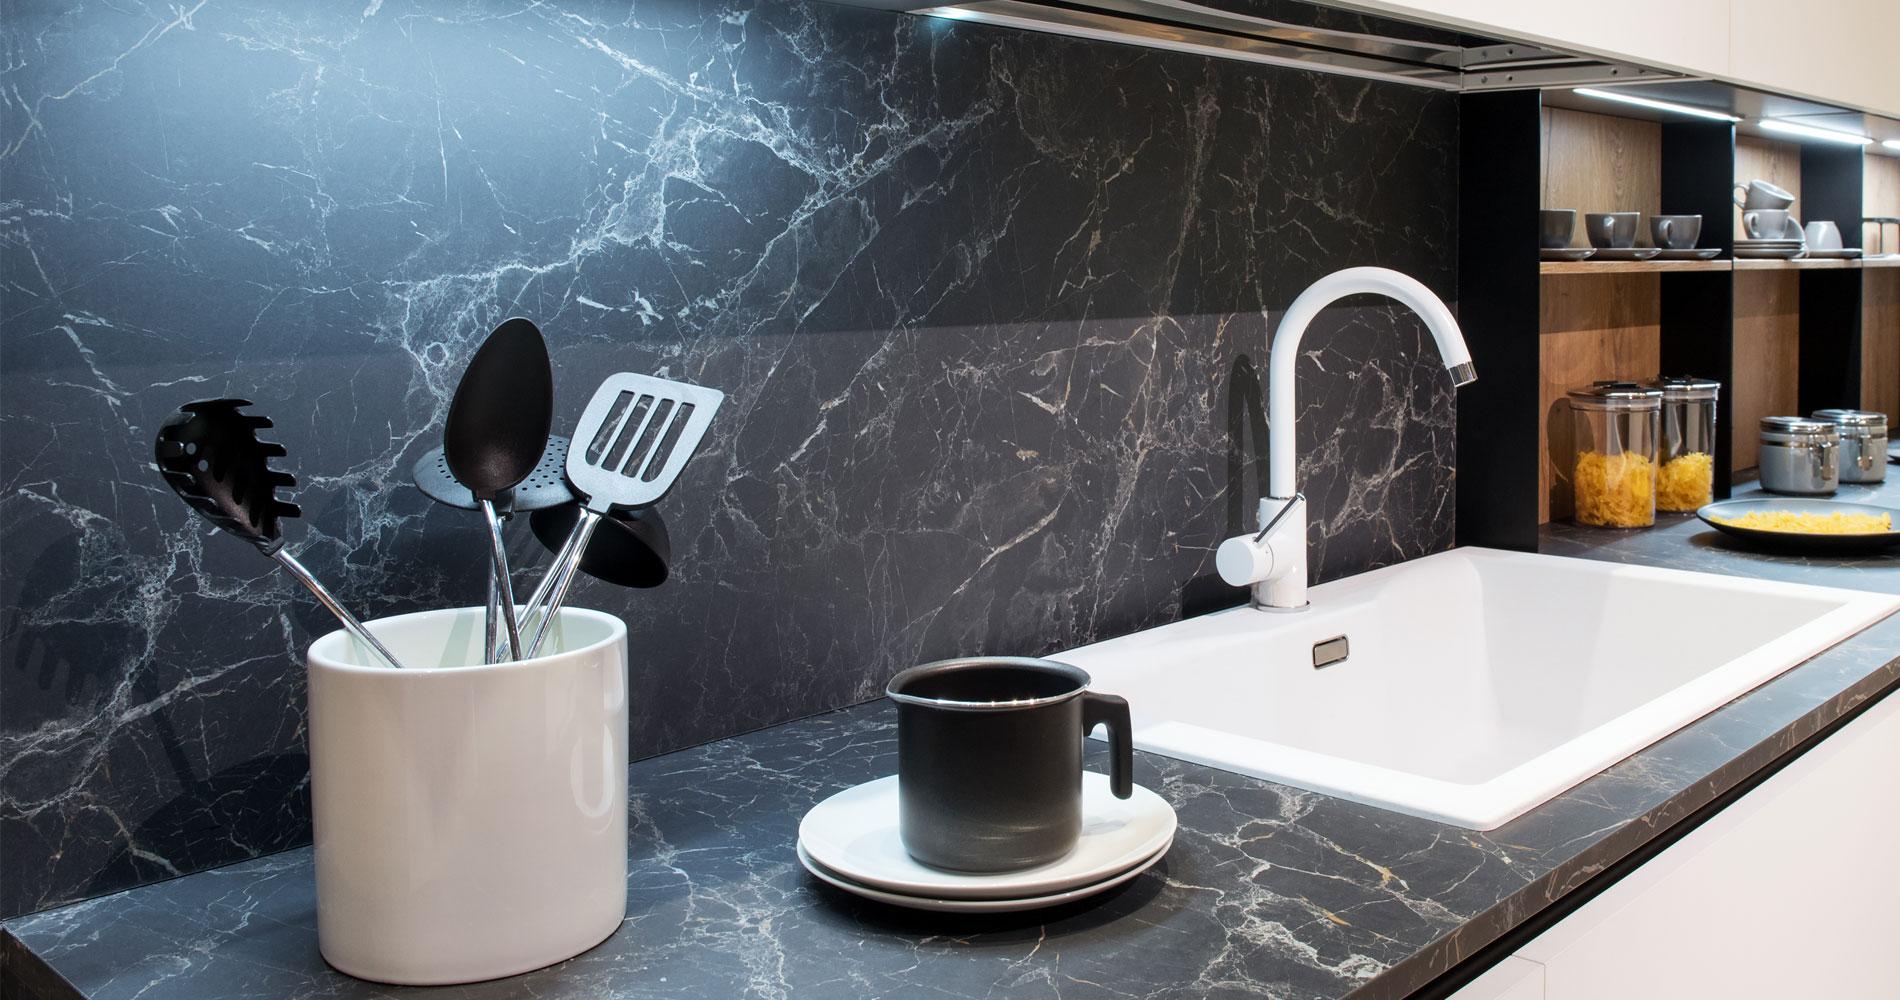 Beautiful custom stone and glass splashbacks with white sink